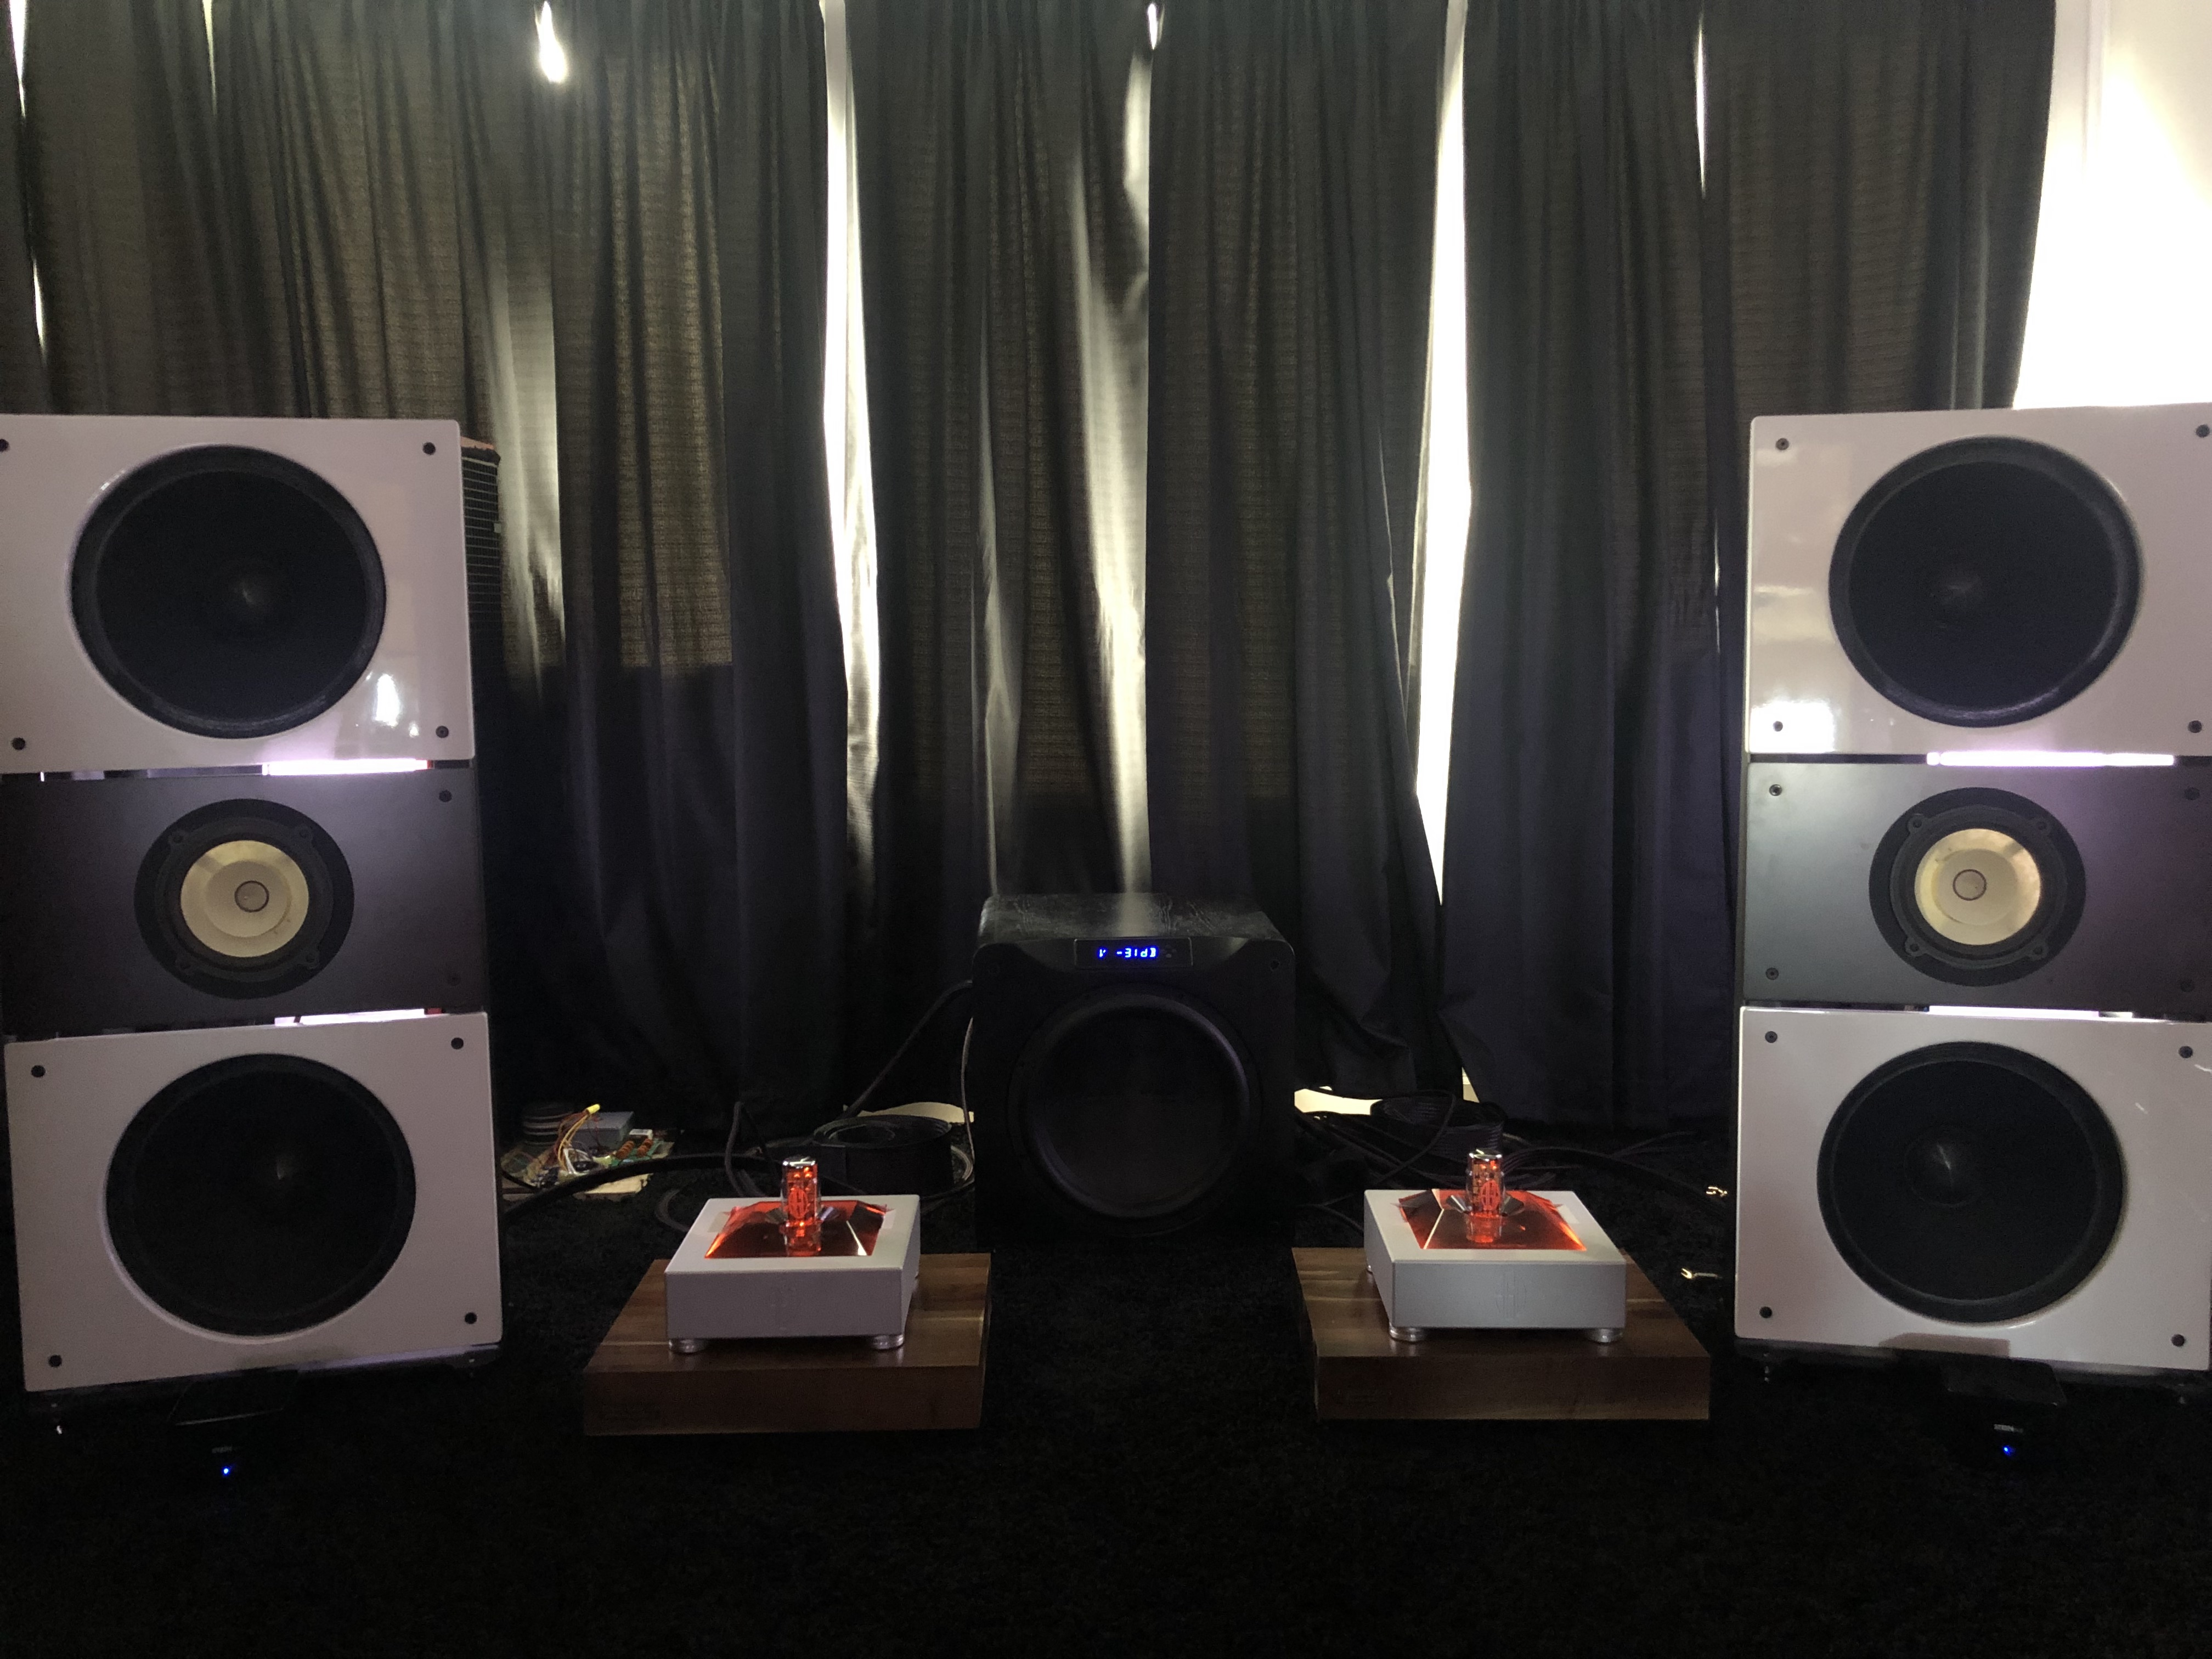 PureAudioProject Trio15 Speaker SystemPureAudioProject Trio15